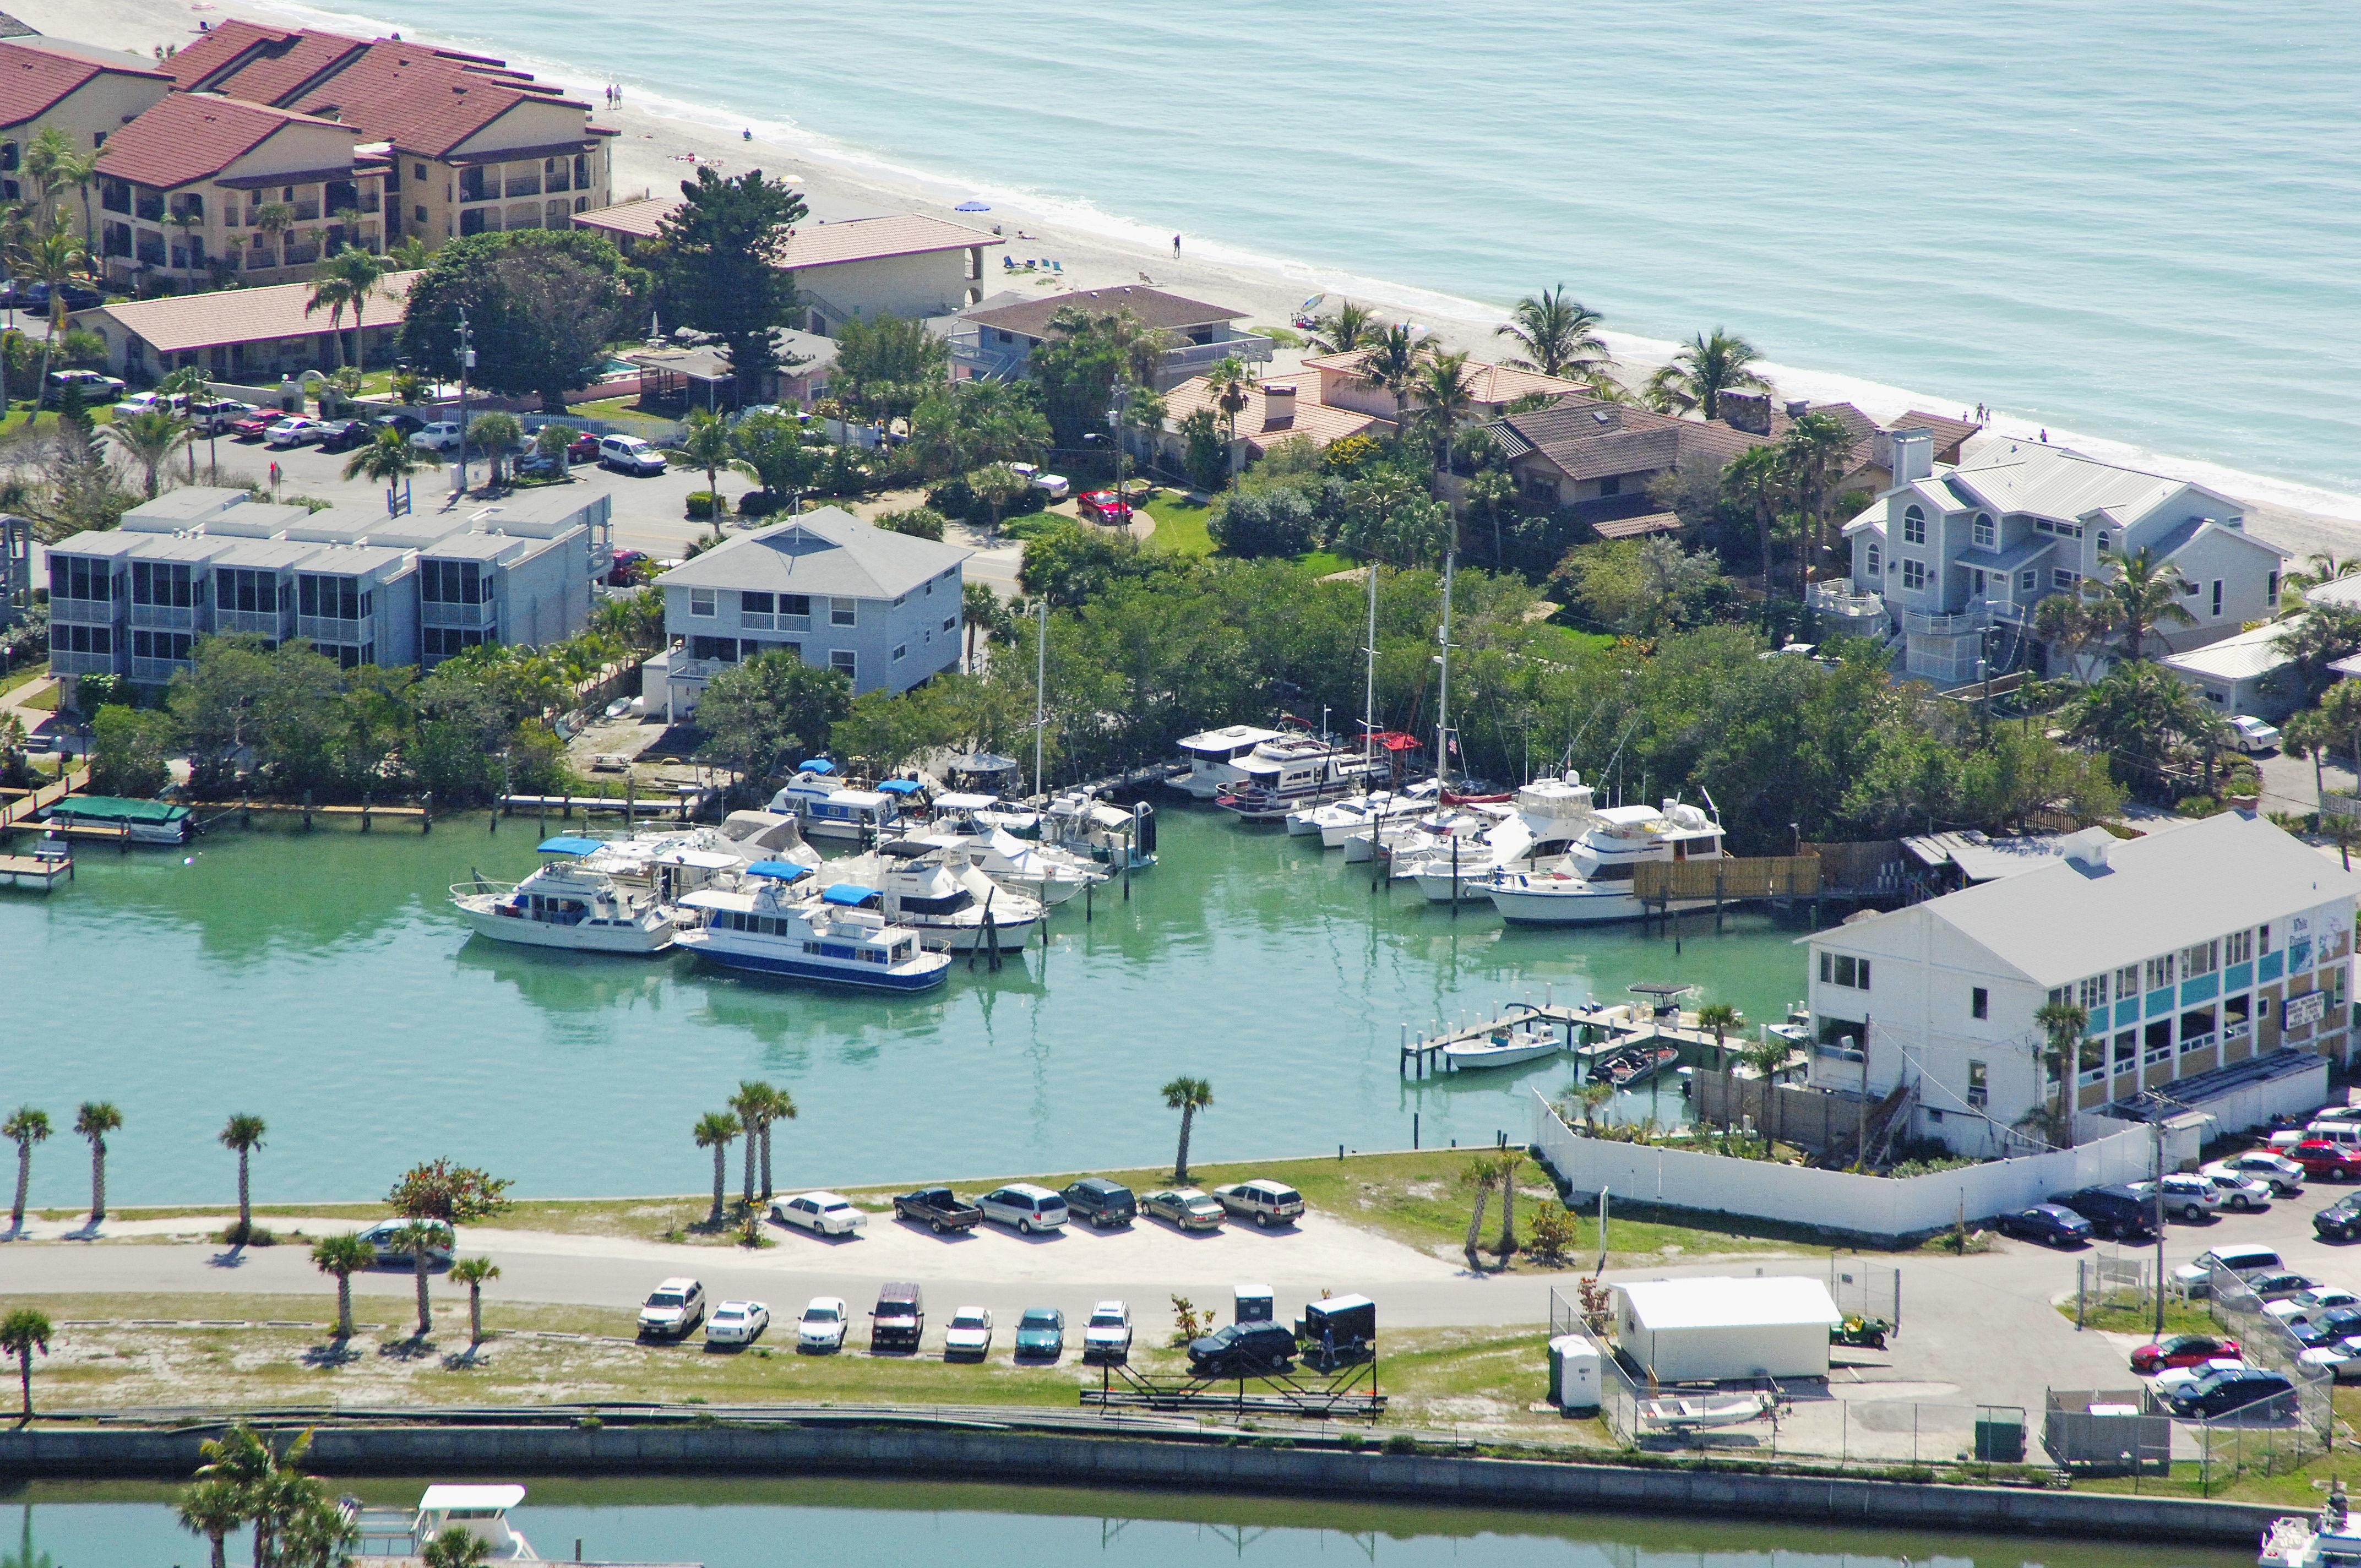 Chadwick Cove Marina in Englewood, FL, United States ...